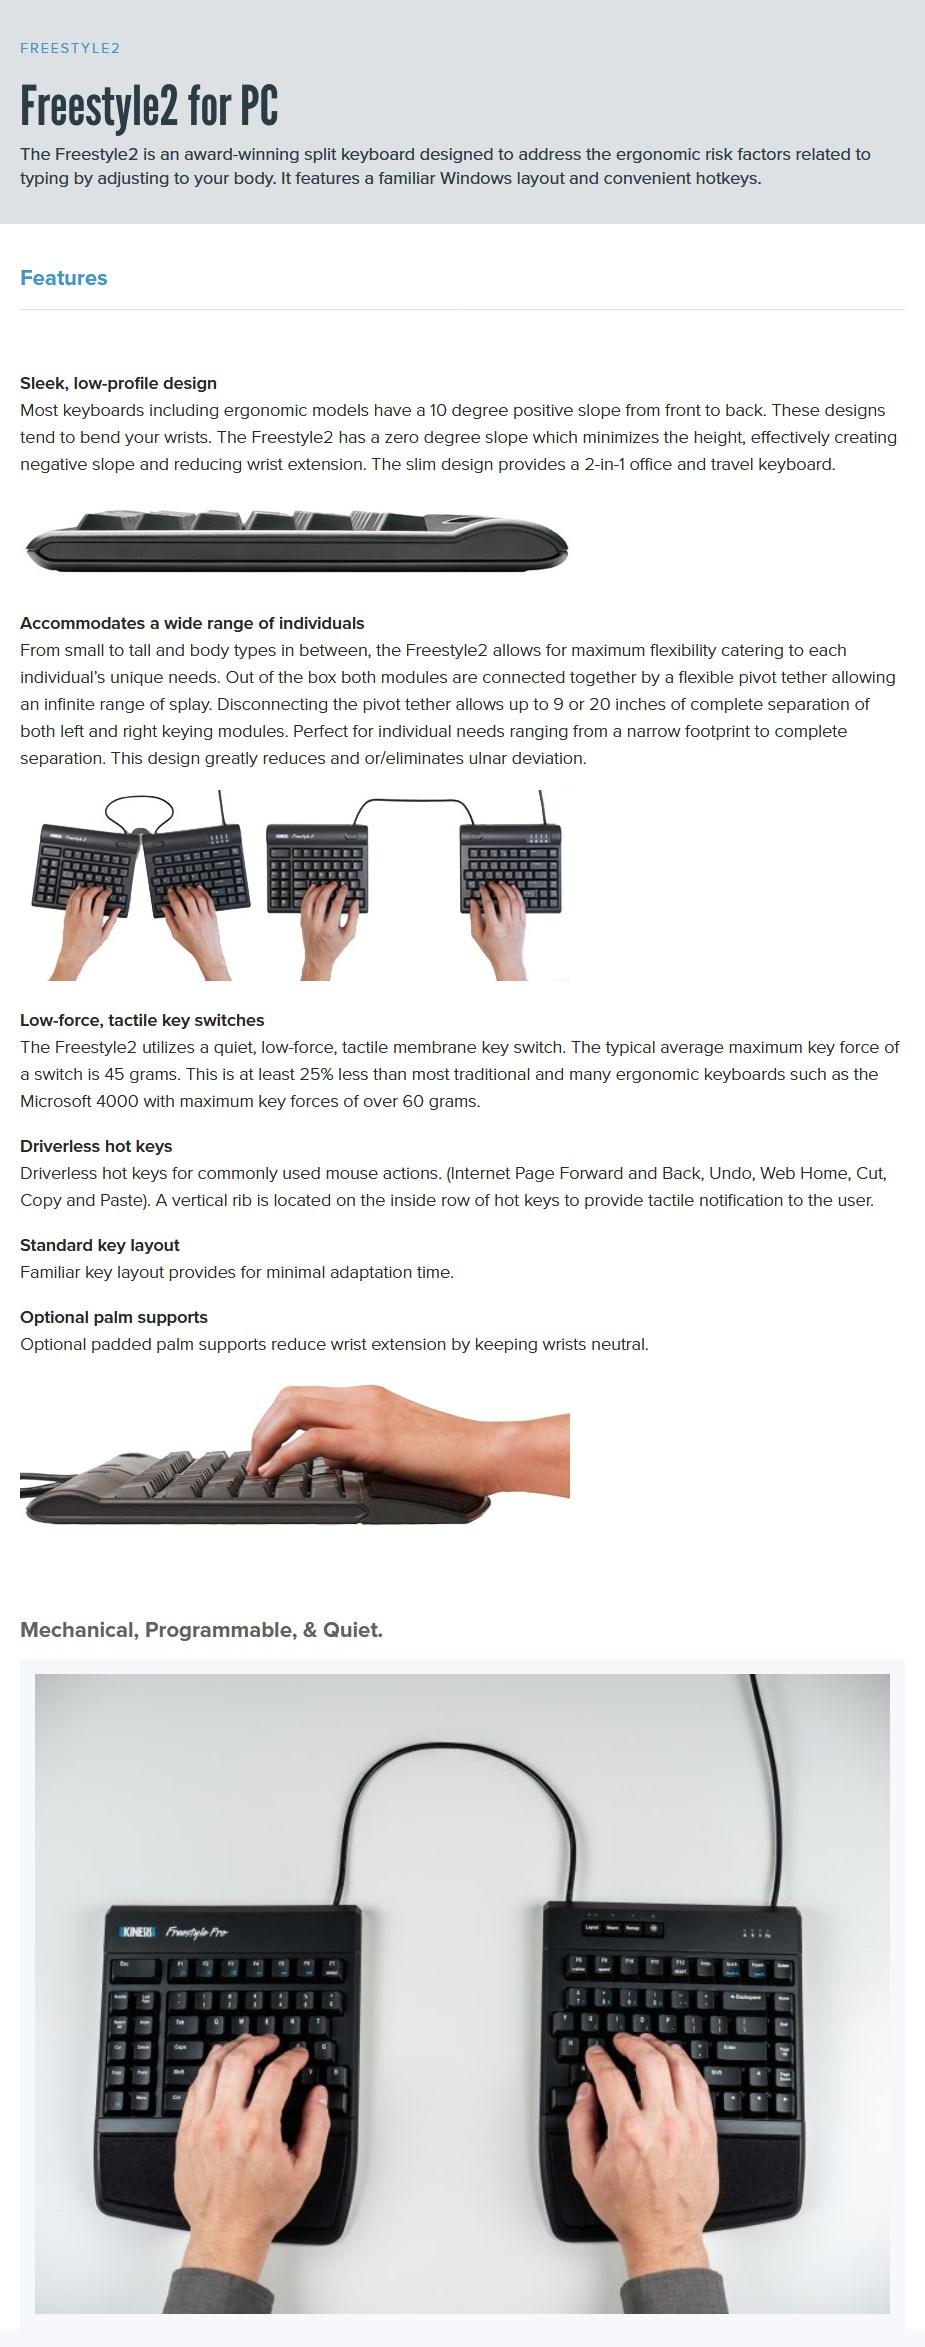 Kinesis Freestyle 2 KB800PB-us-2 PC Split Keyboard - Overview 1